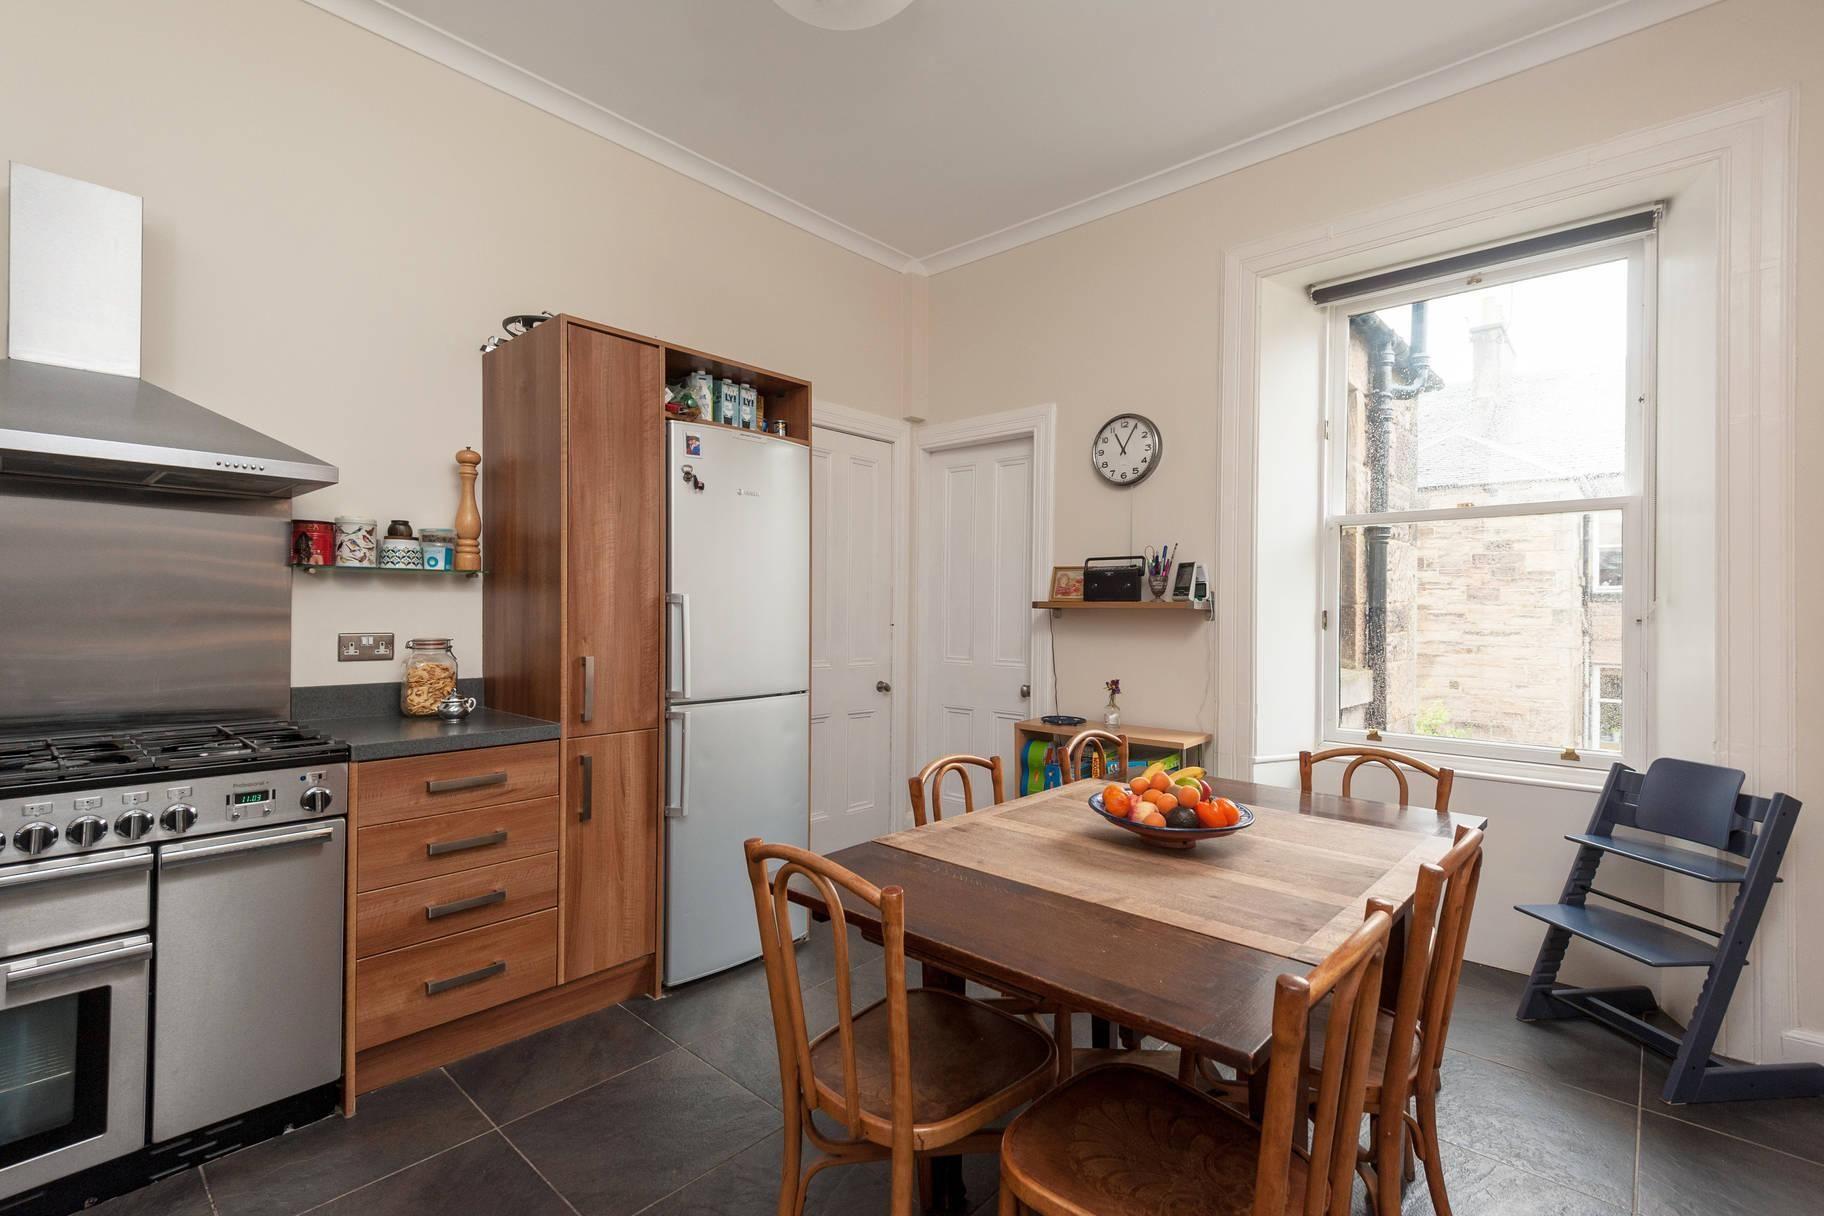 3 Briarbank Terrace, Shandon - Photo 4